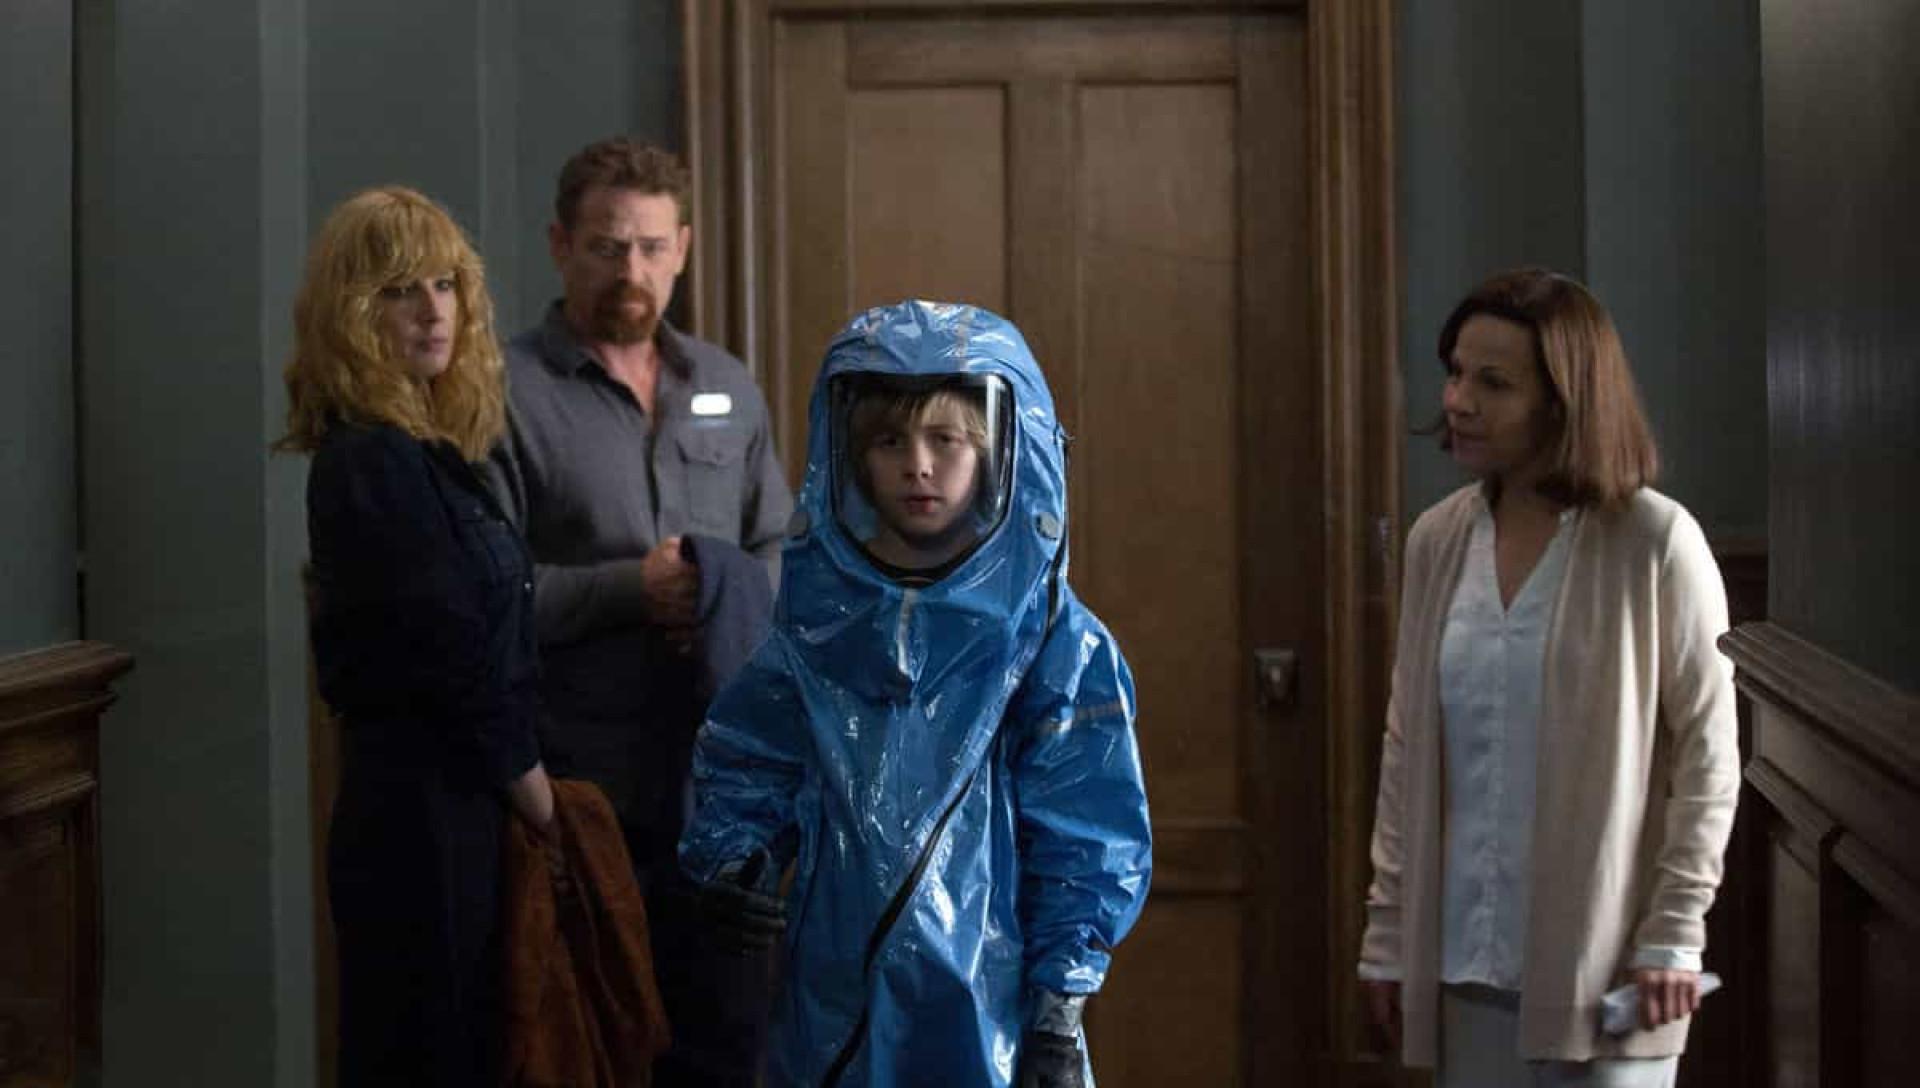 Novo filme de terror da Netflix chega a tempo do Halloween